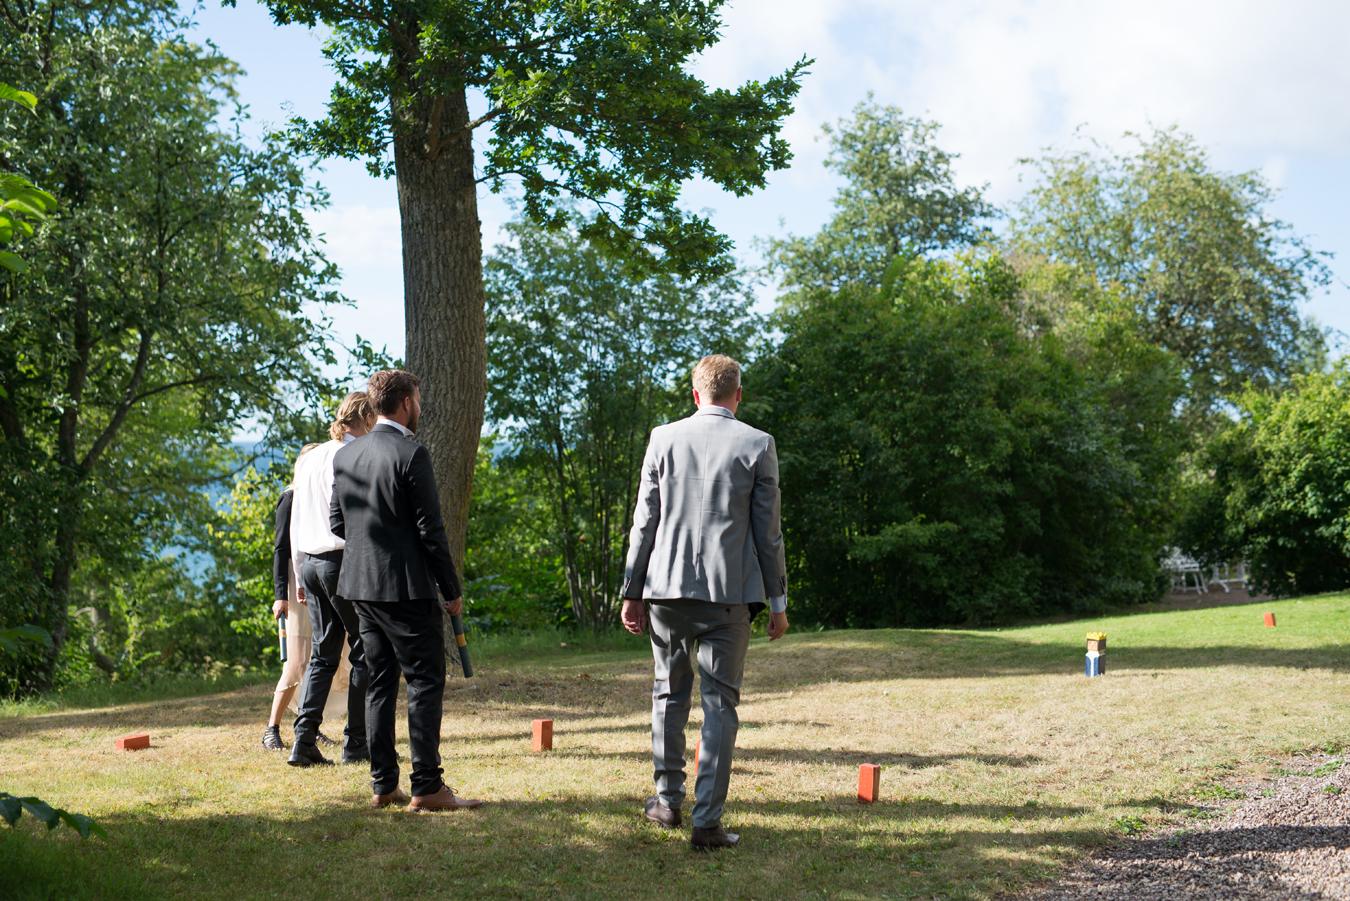 052-bröllop-gotland-fridhem-neas-fotografi.jpg